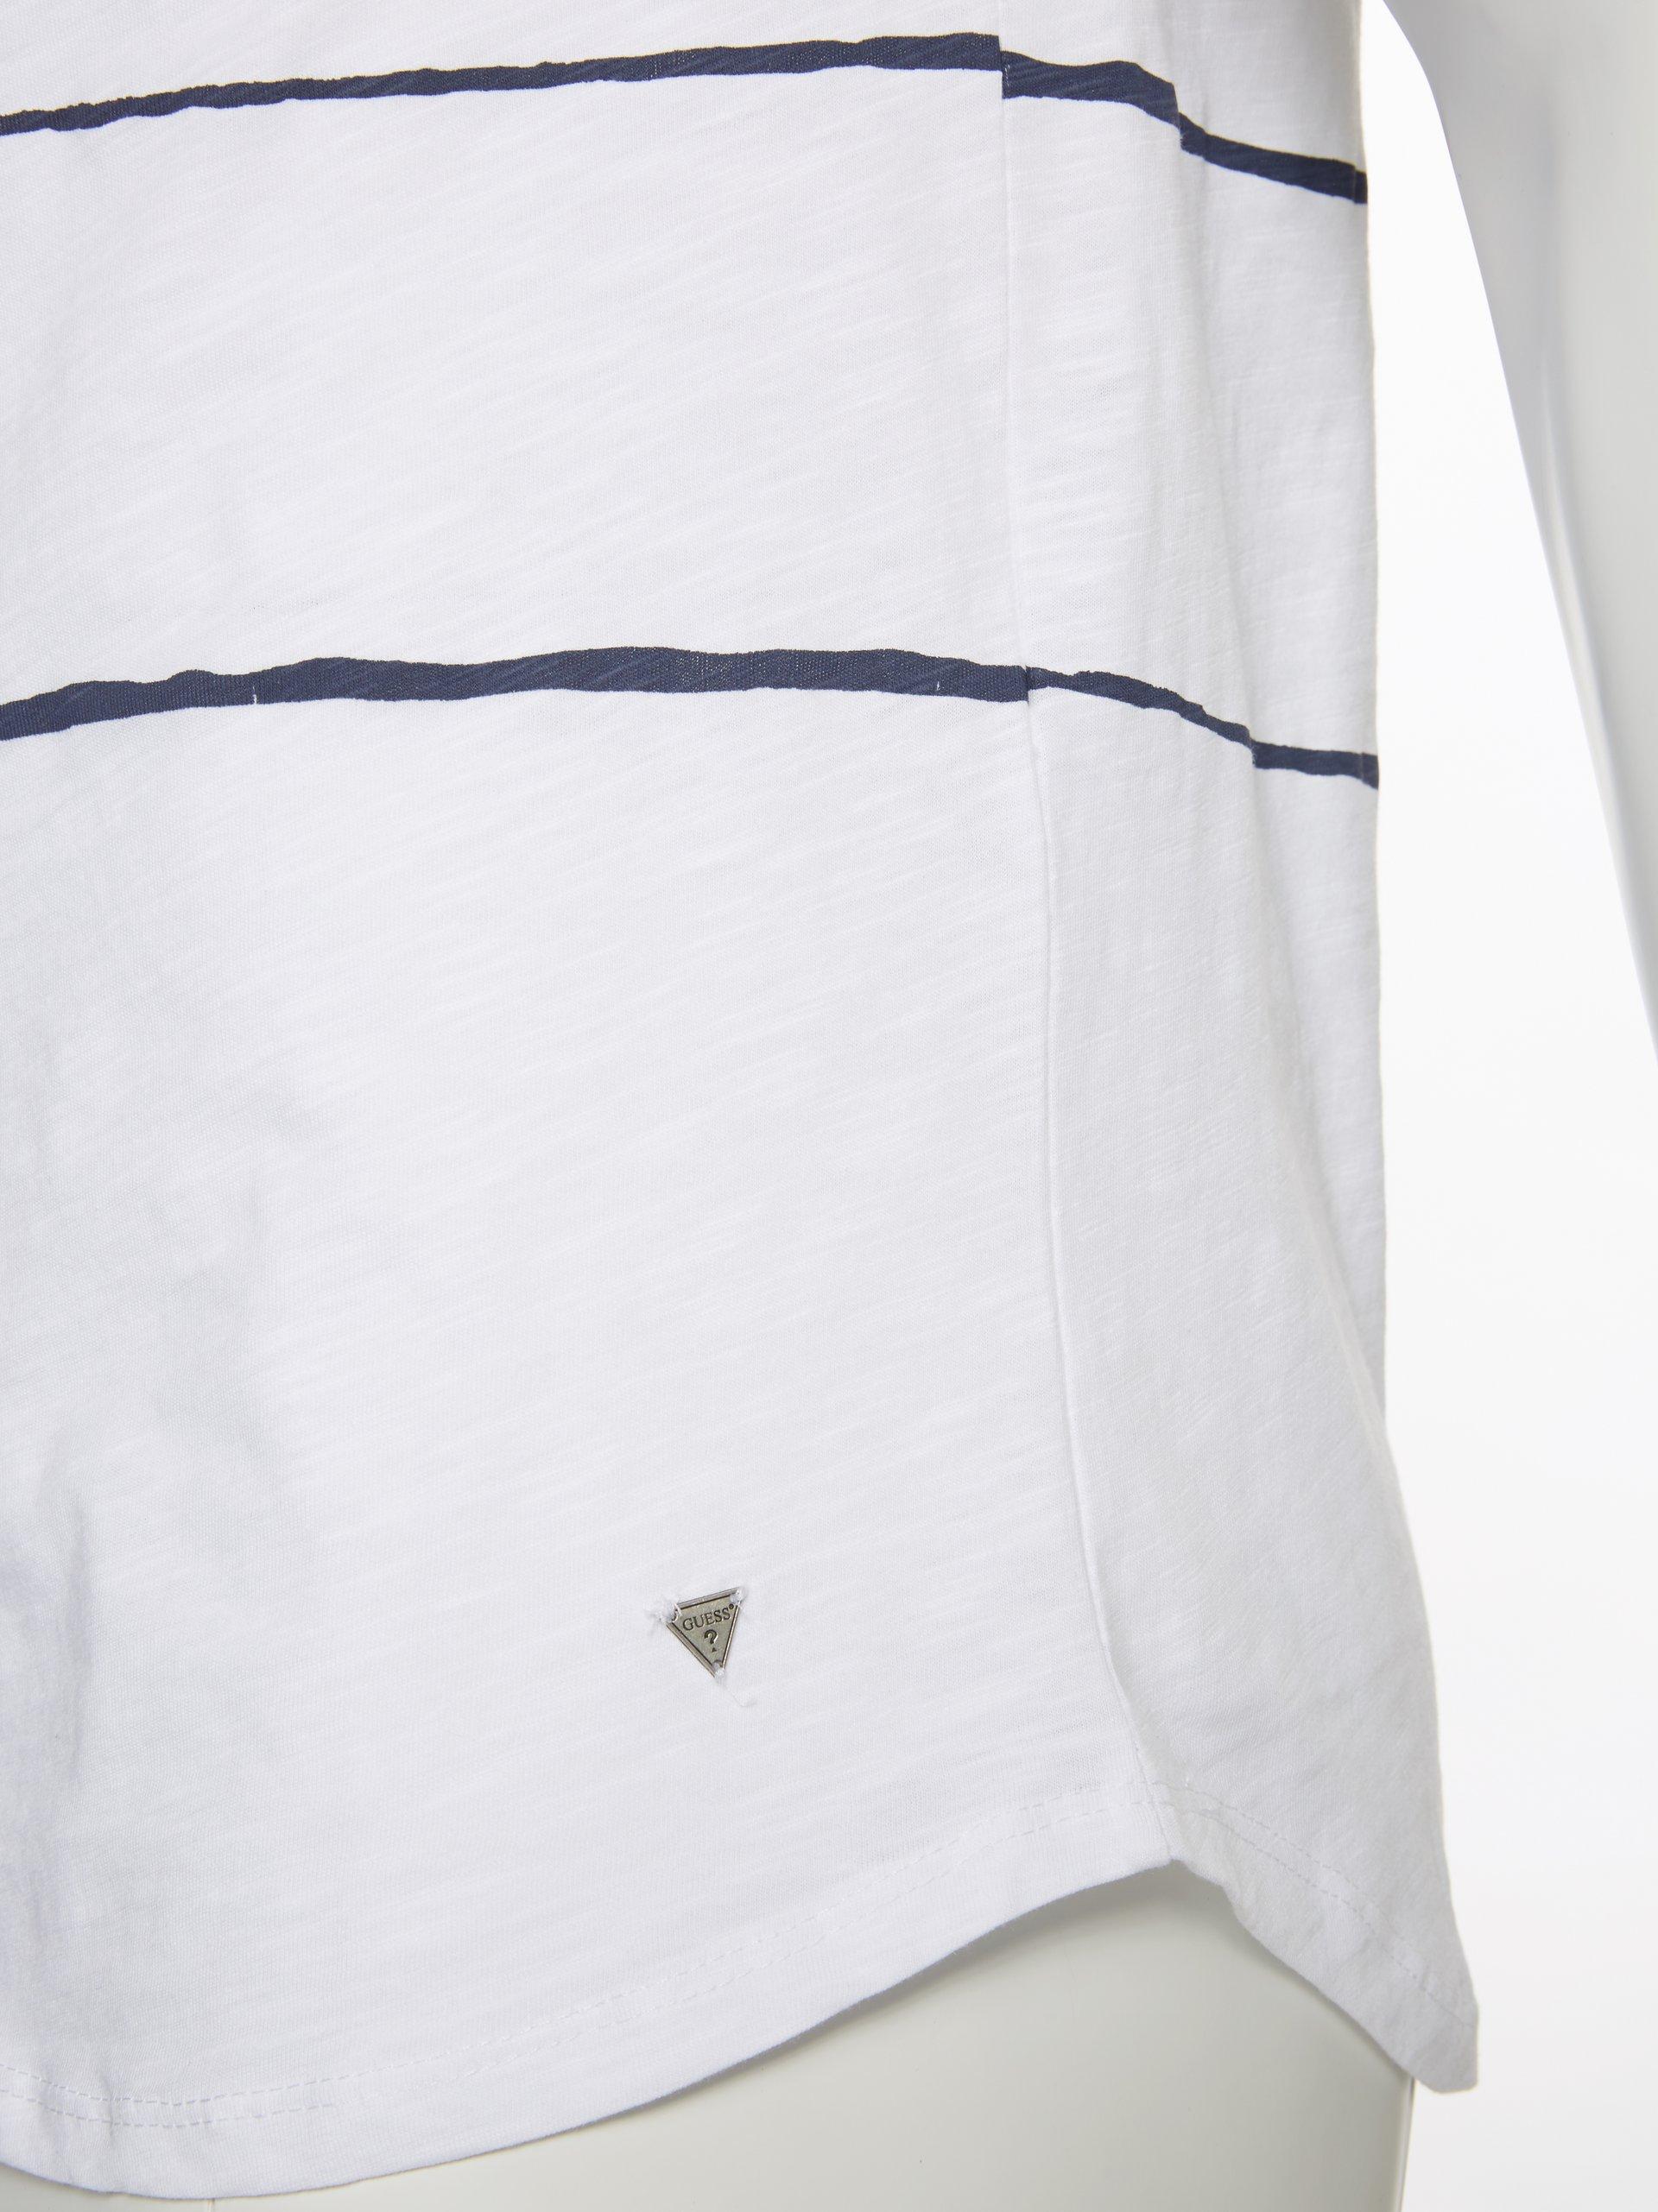 guess jeans herren t shirt marine wei gestreift online. Black Bedroom Furniture Sets. Home Design Ideas